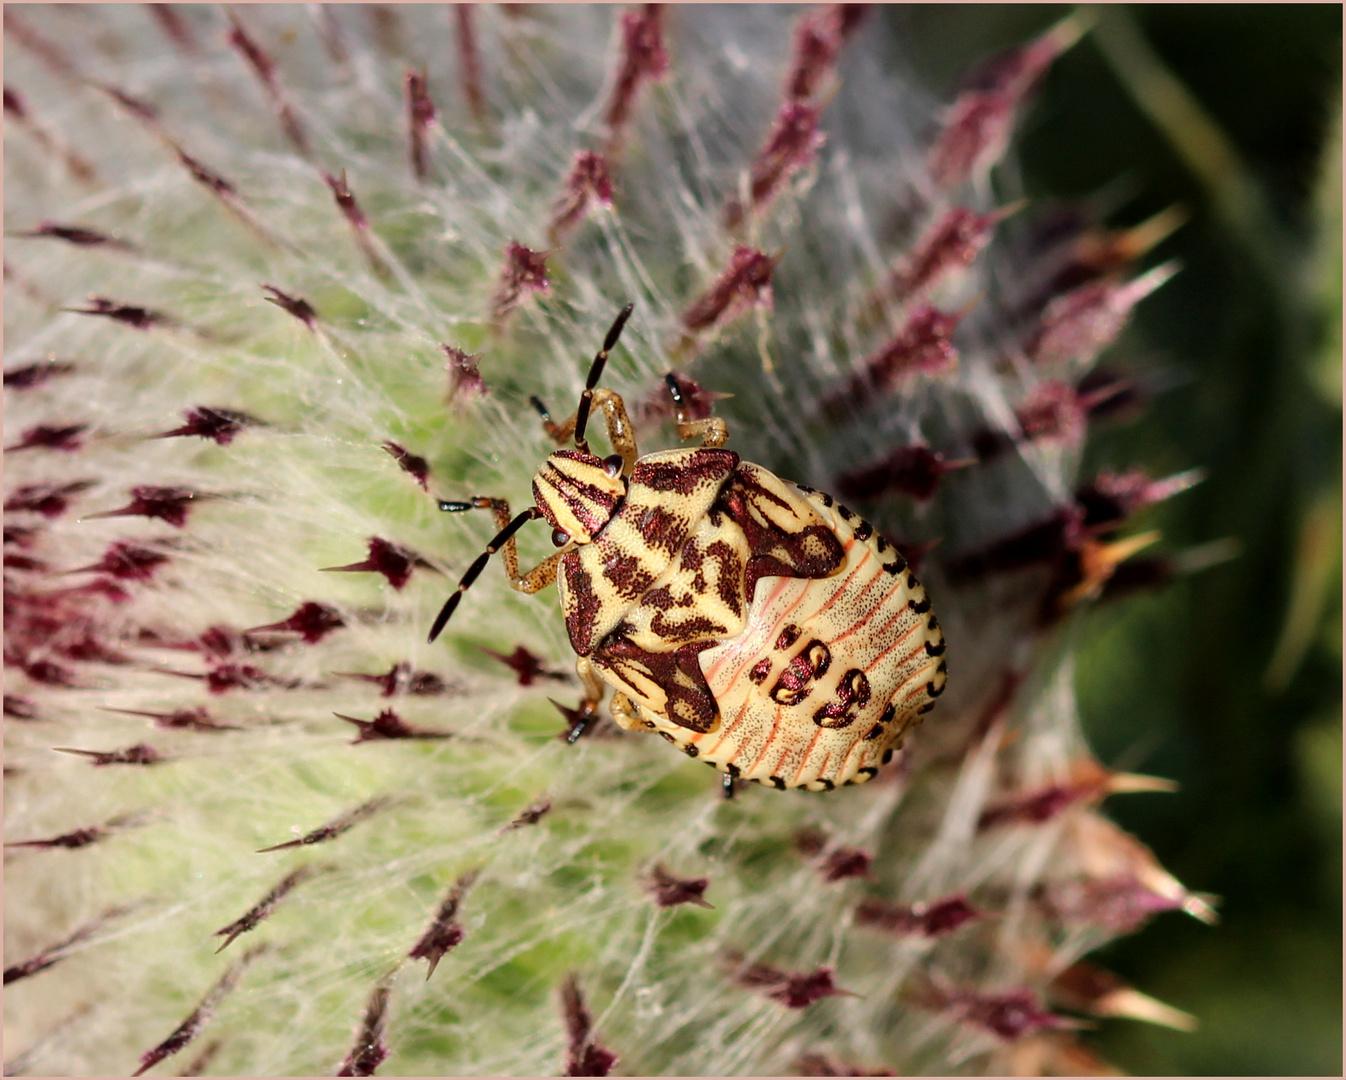 Nymphe einer Streifenwanze (Graphosoma lineatum).